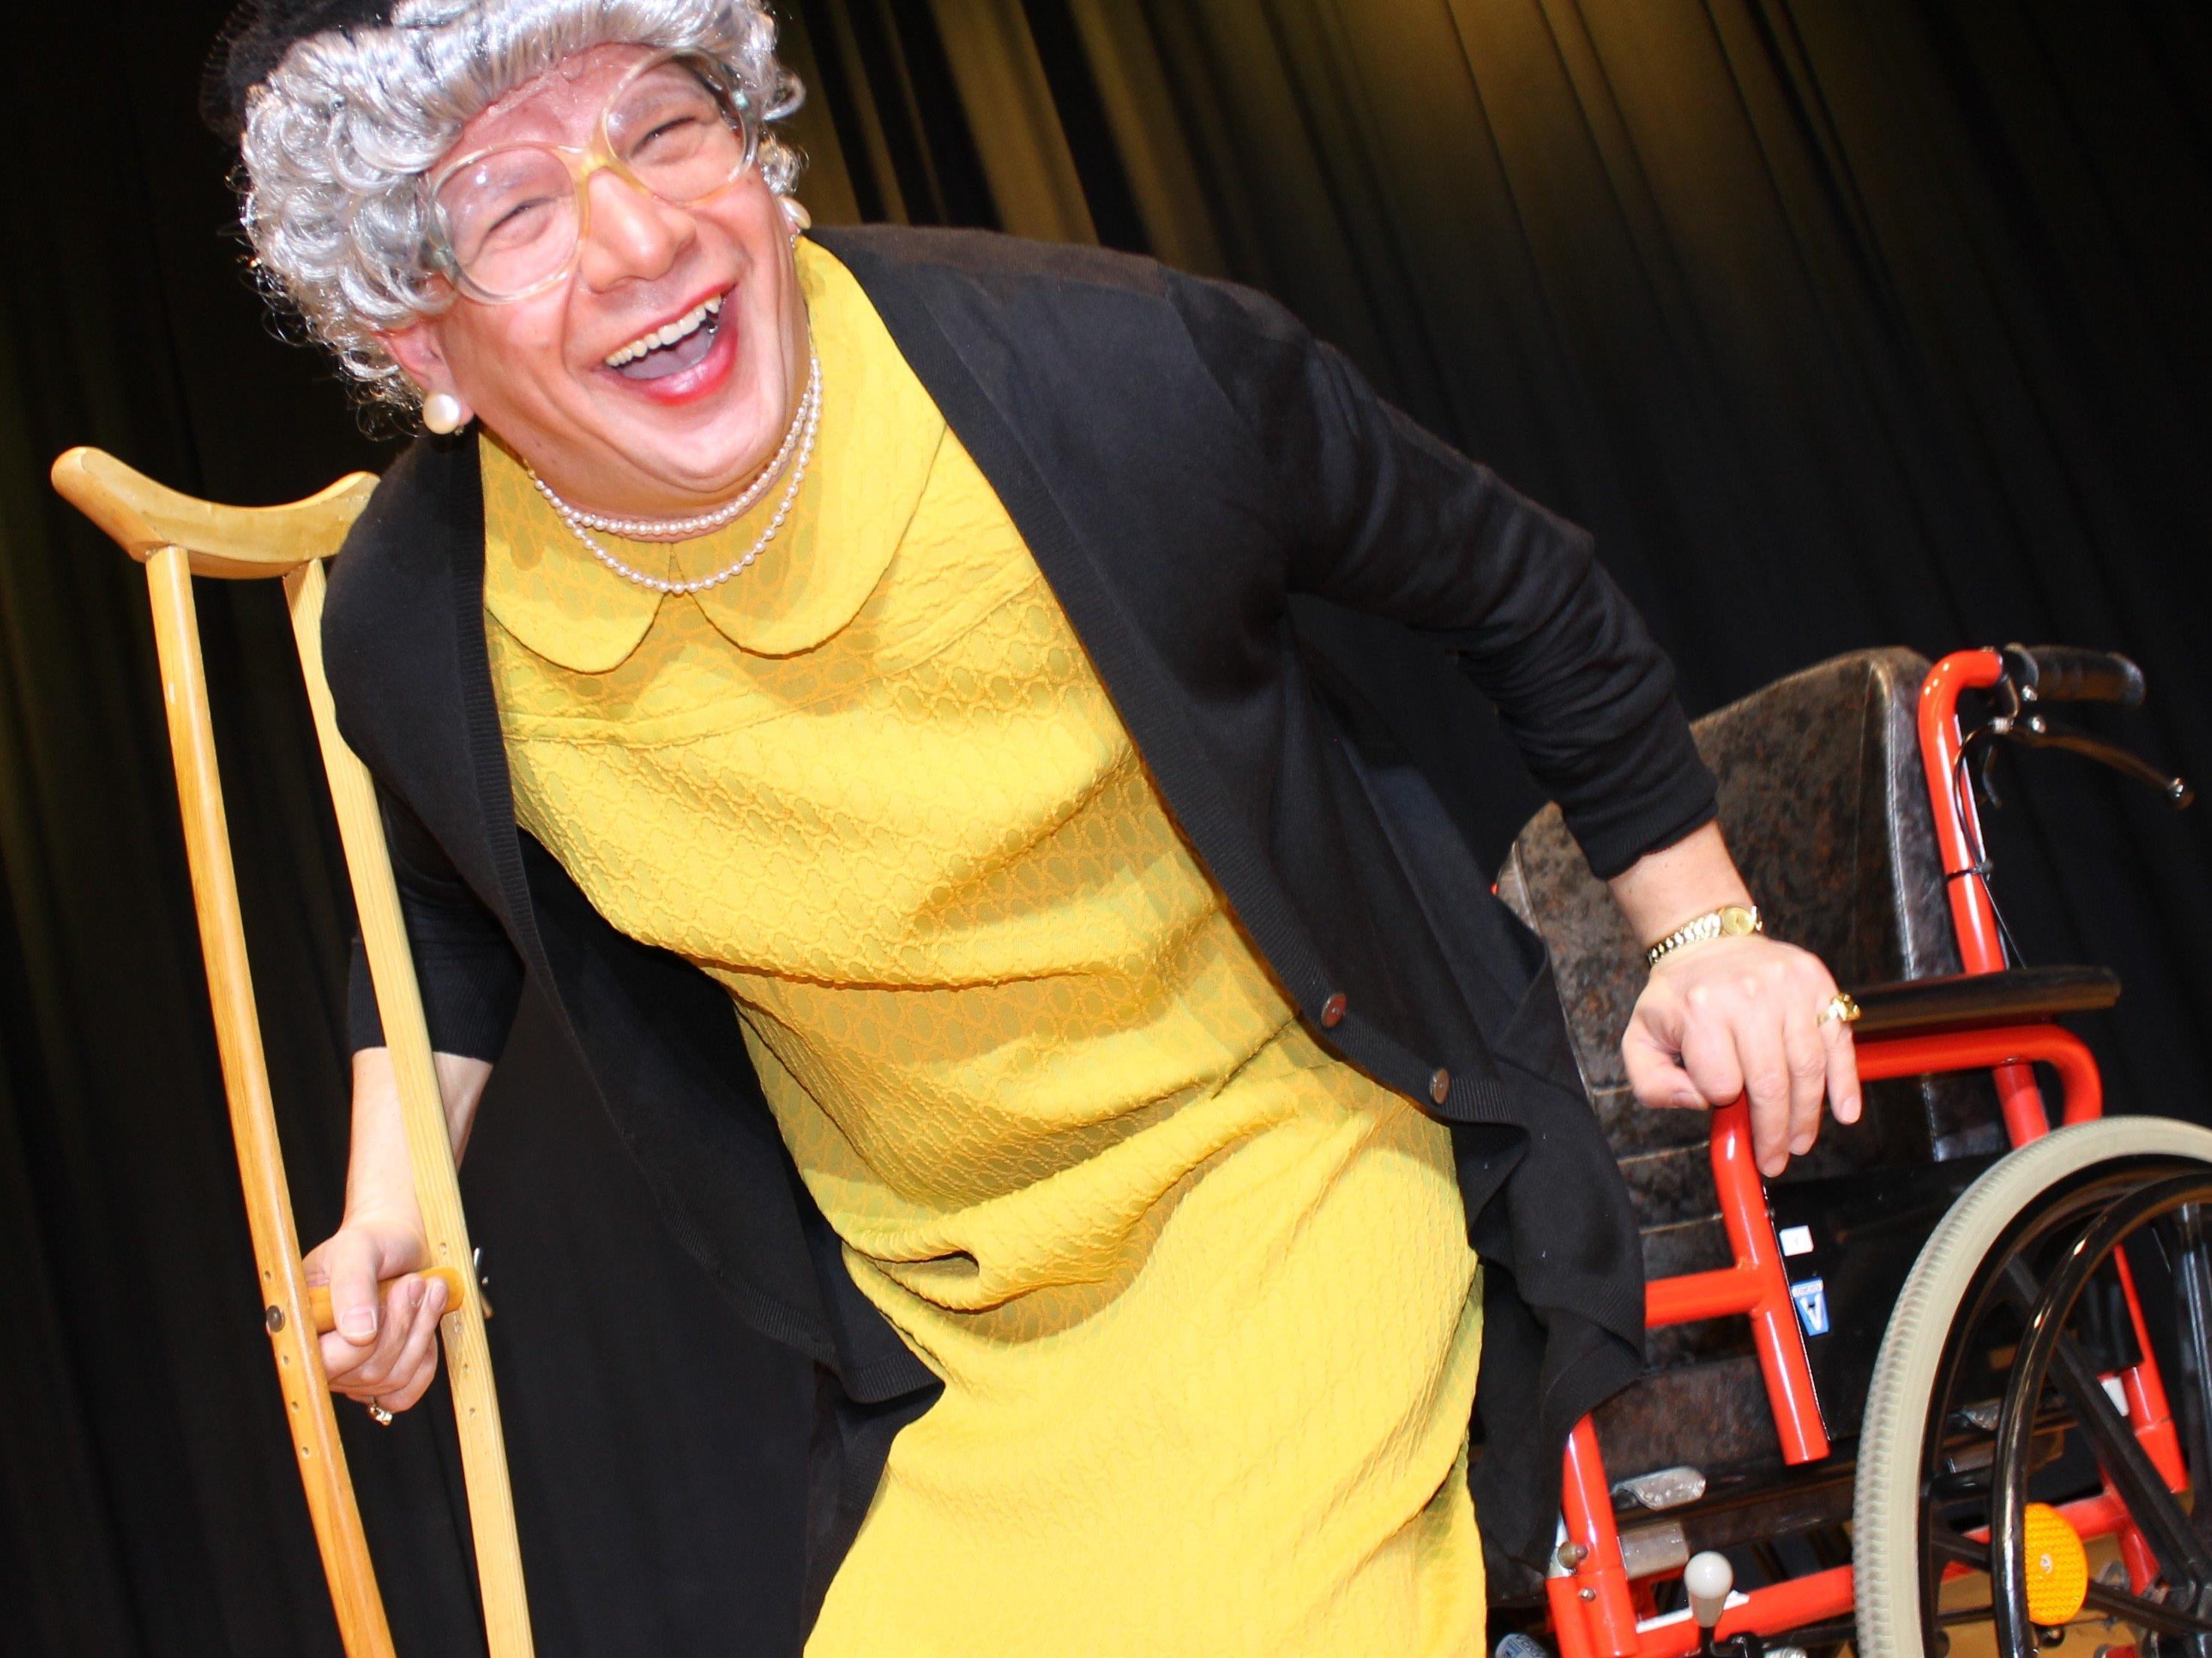 Oma Lilli, alias Comedian Christian Mair, besucht am 13. Oktober den Gemeindesaal Damüls